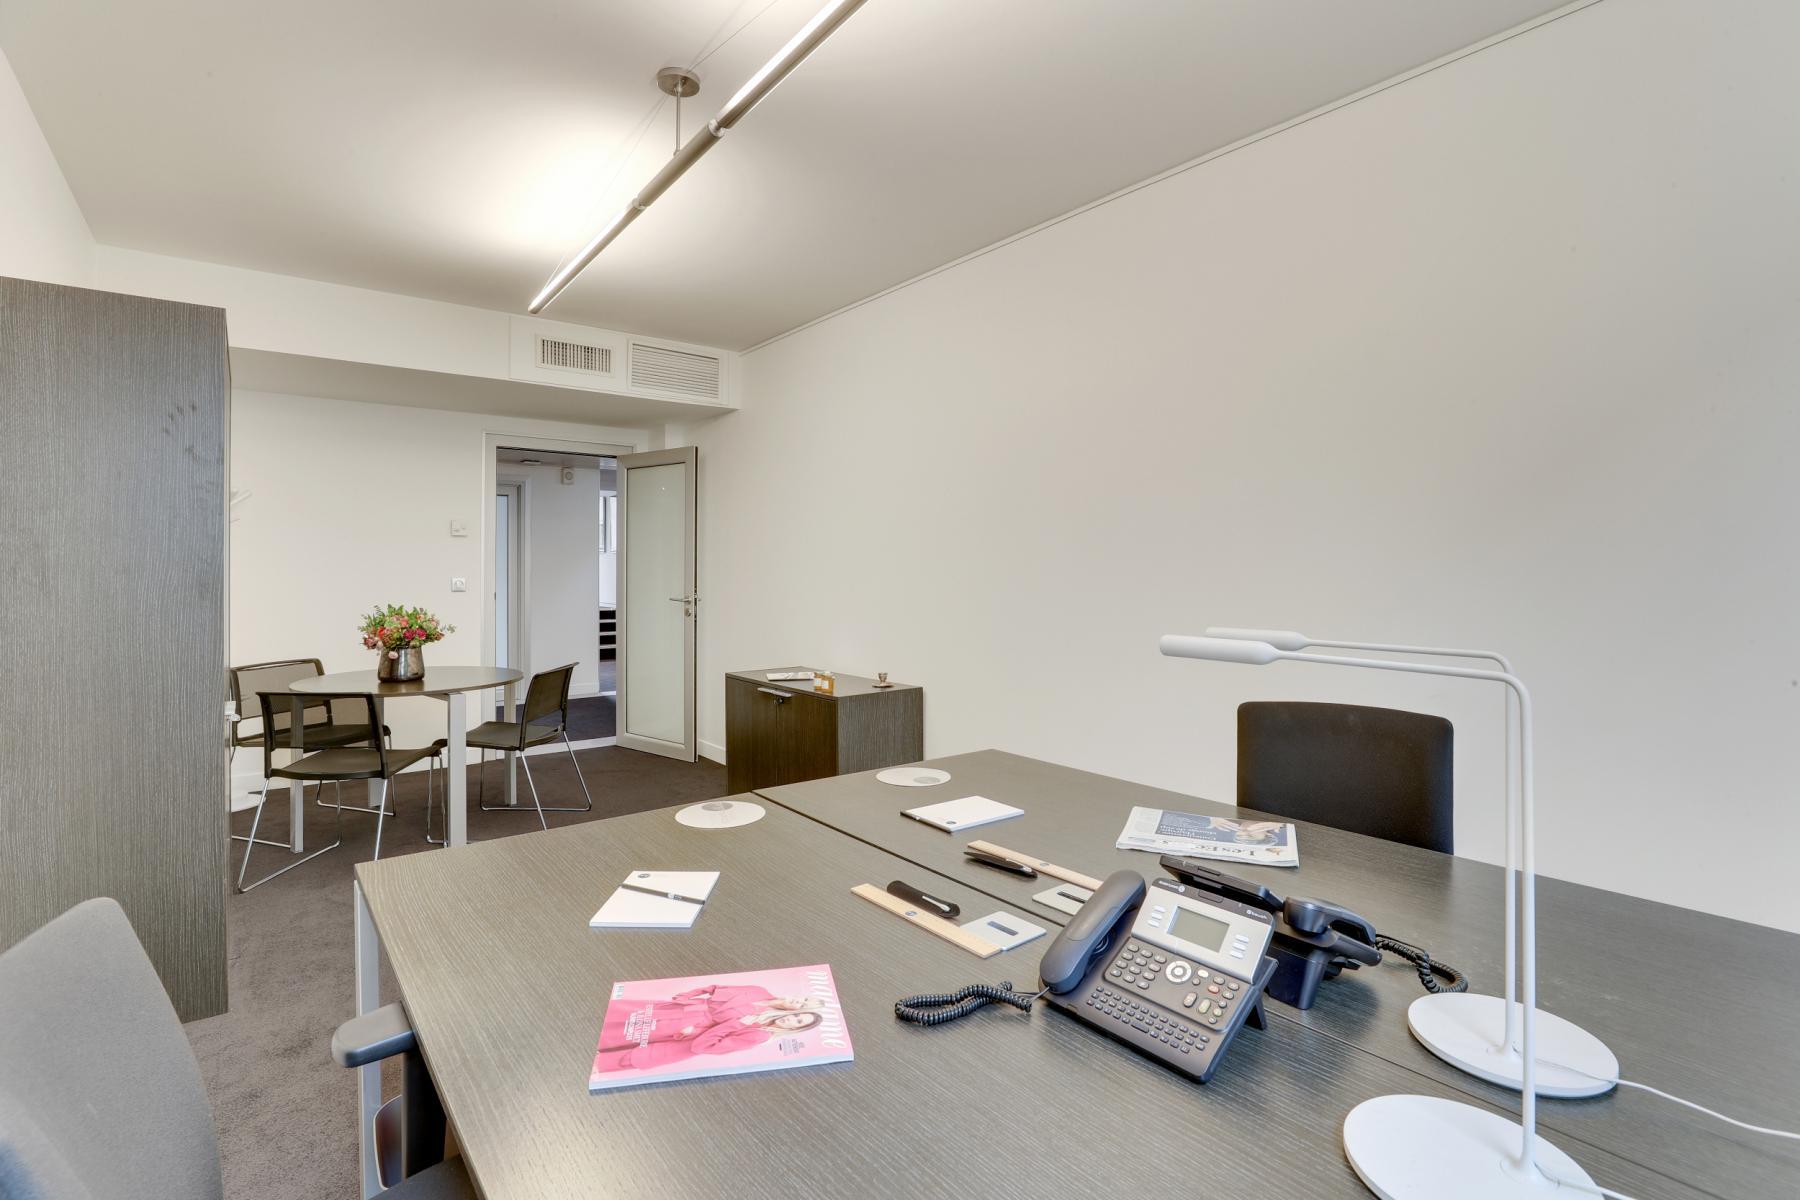 Location bureau Rue Quentin-Bauchart 20, Paris (9)